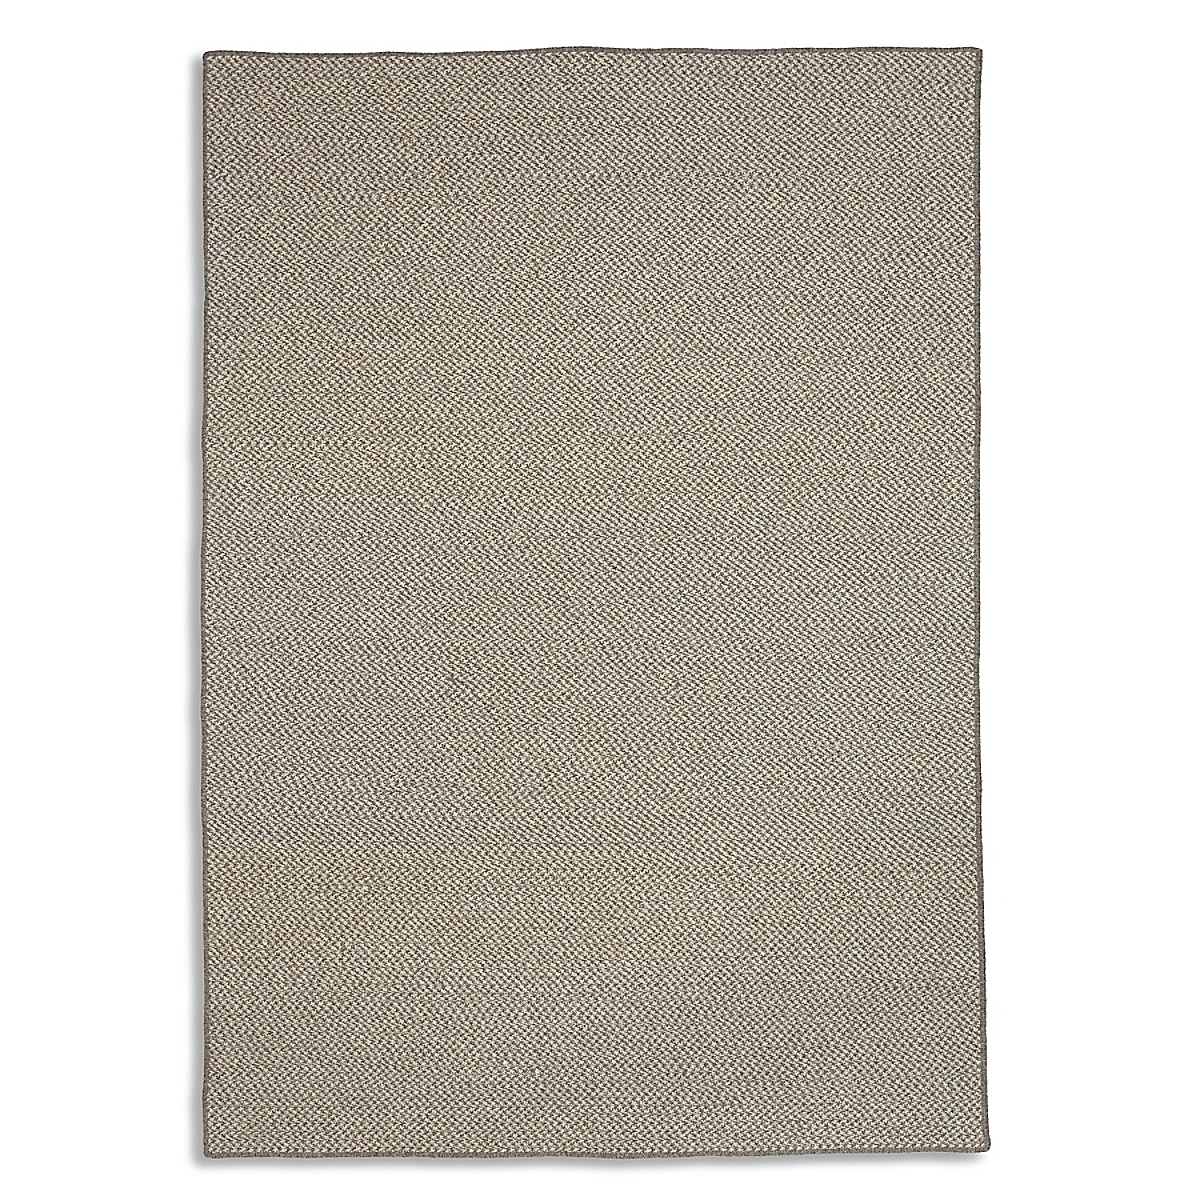 Houndstooth Wool Rug - Slate